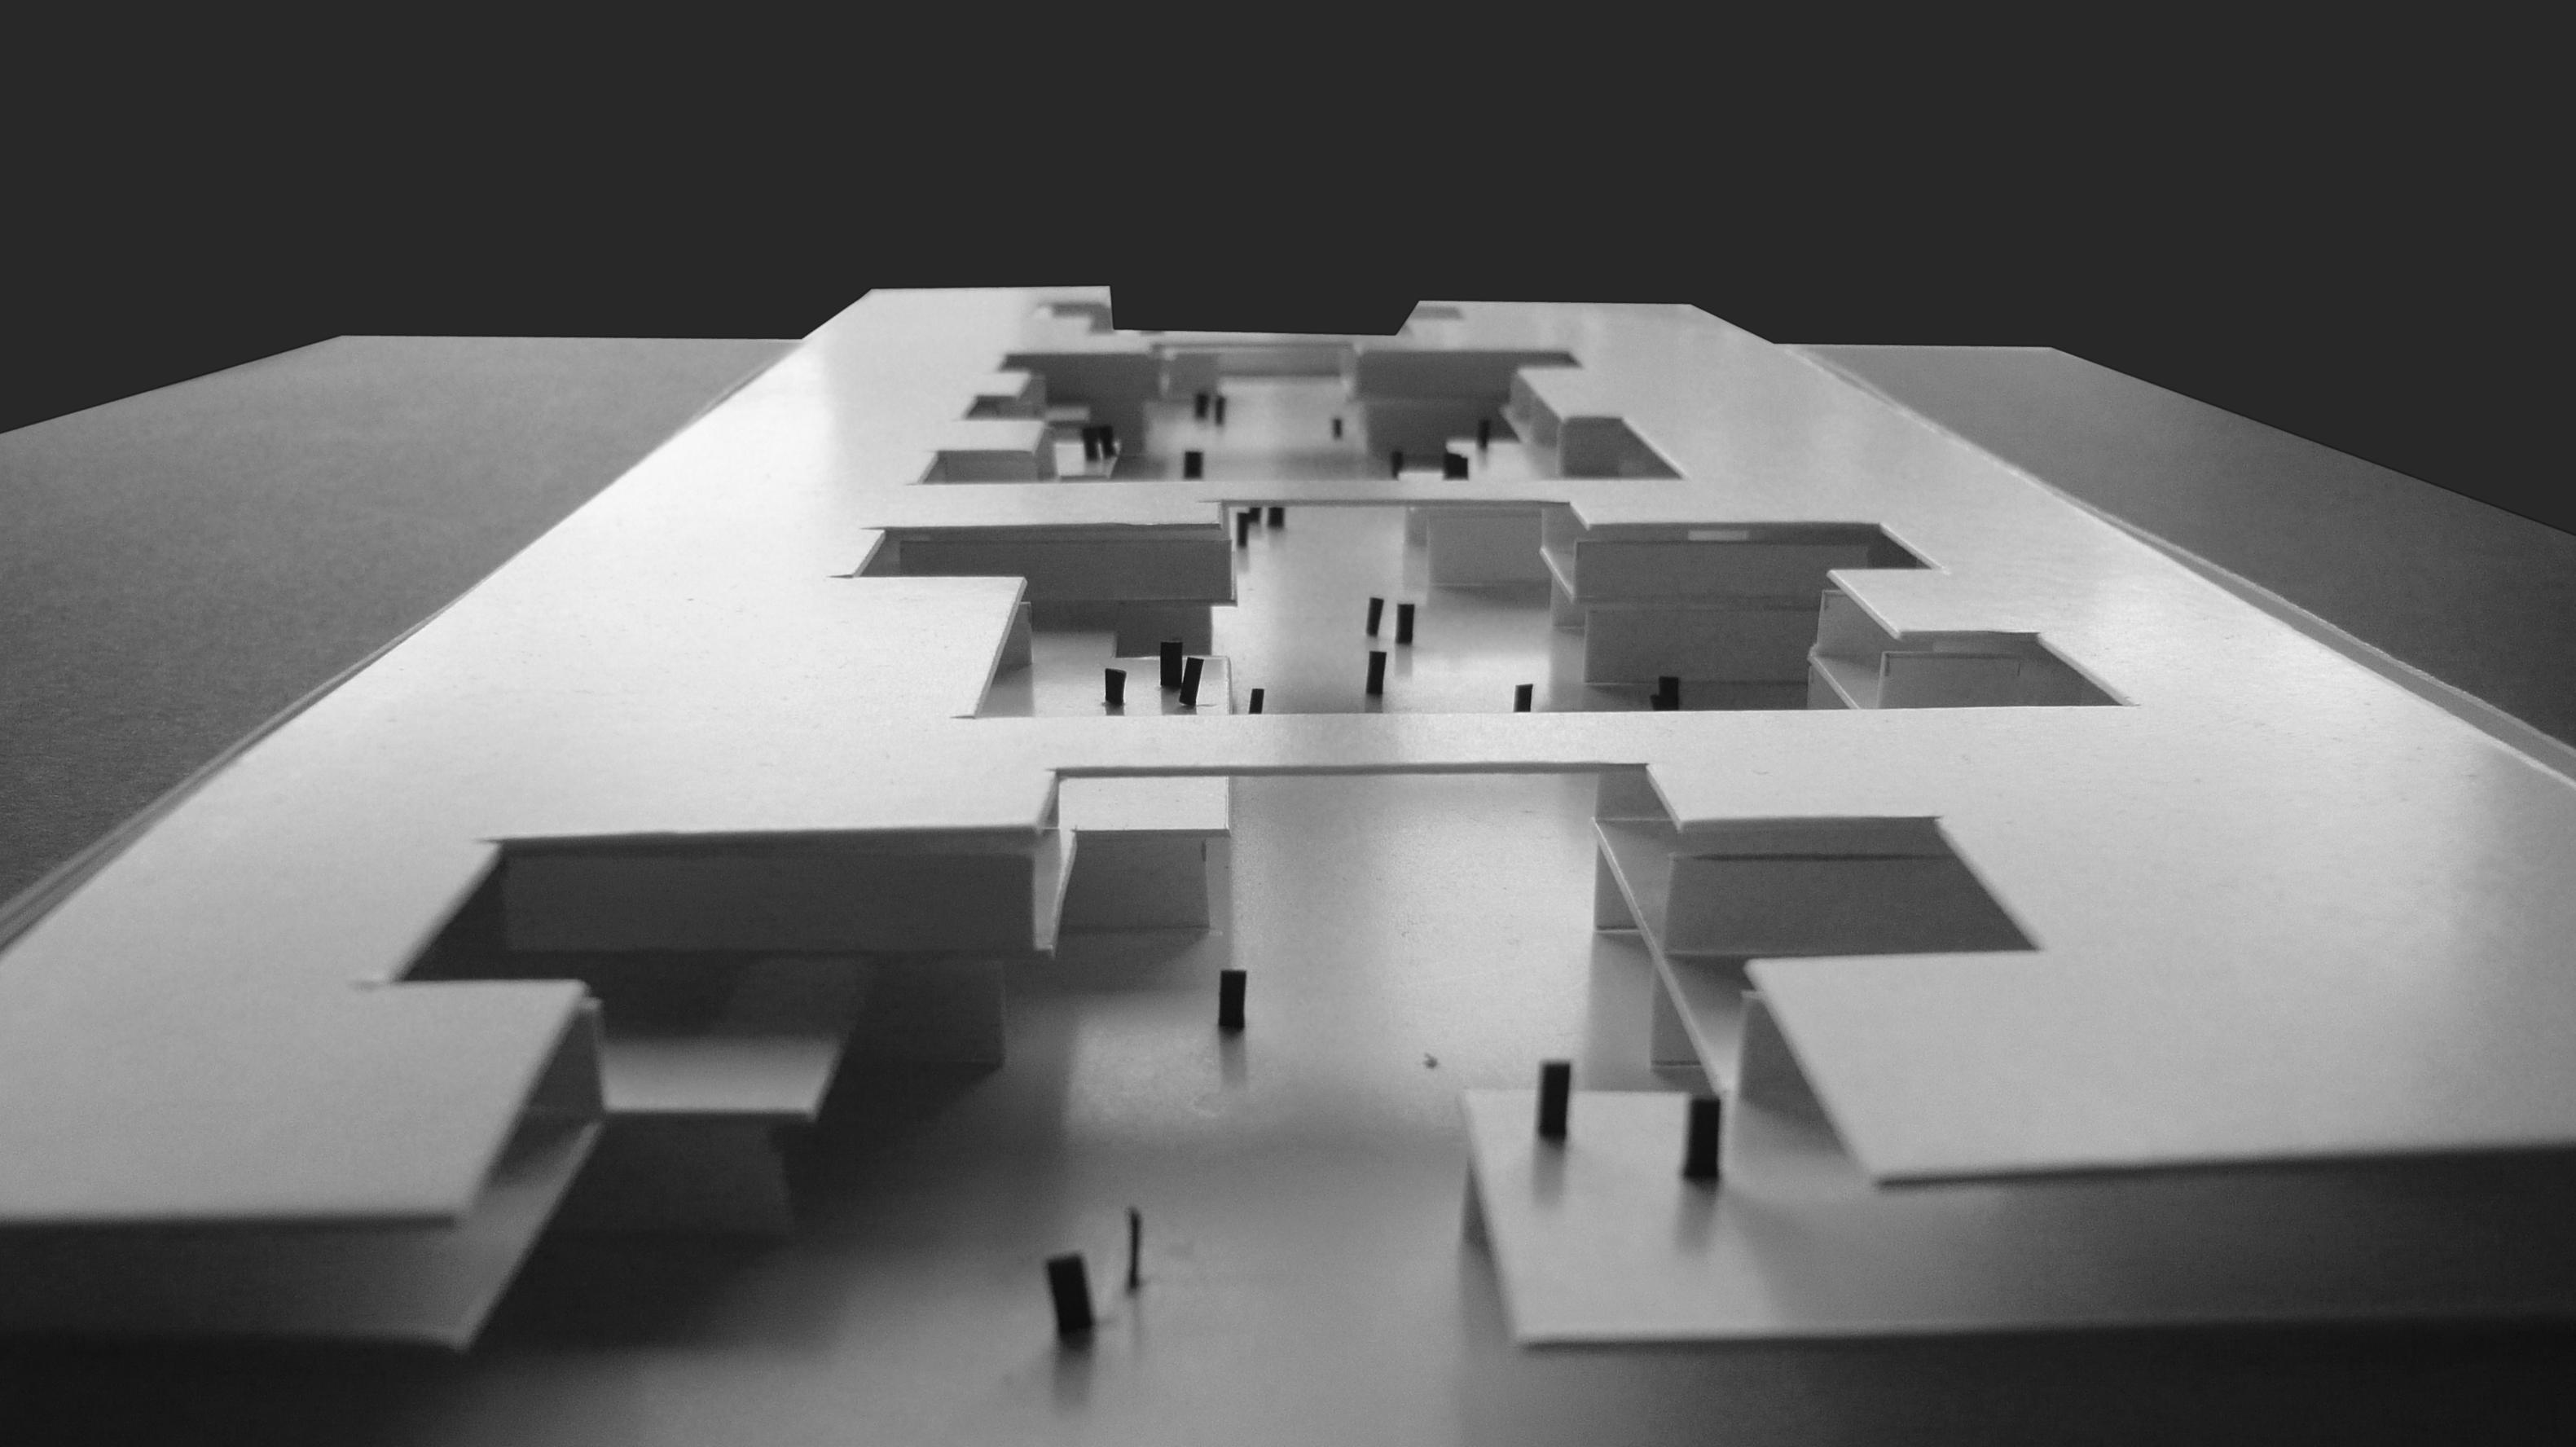 Proyectos in s lucas for Universidades para arquitectura